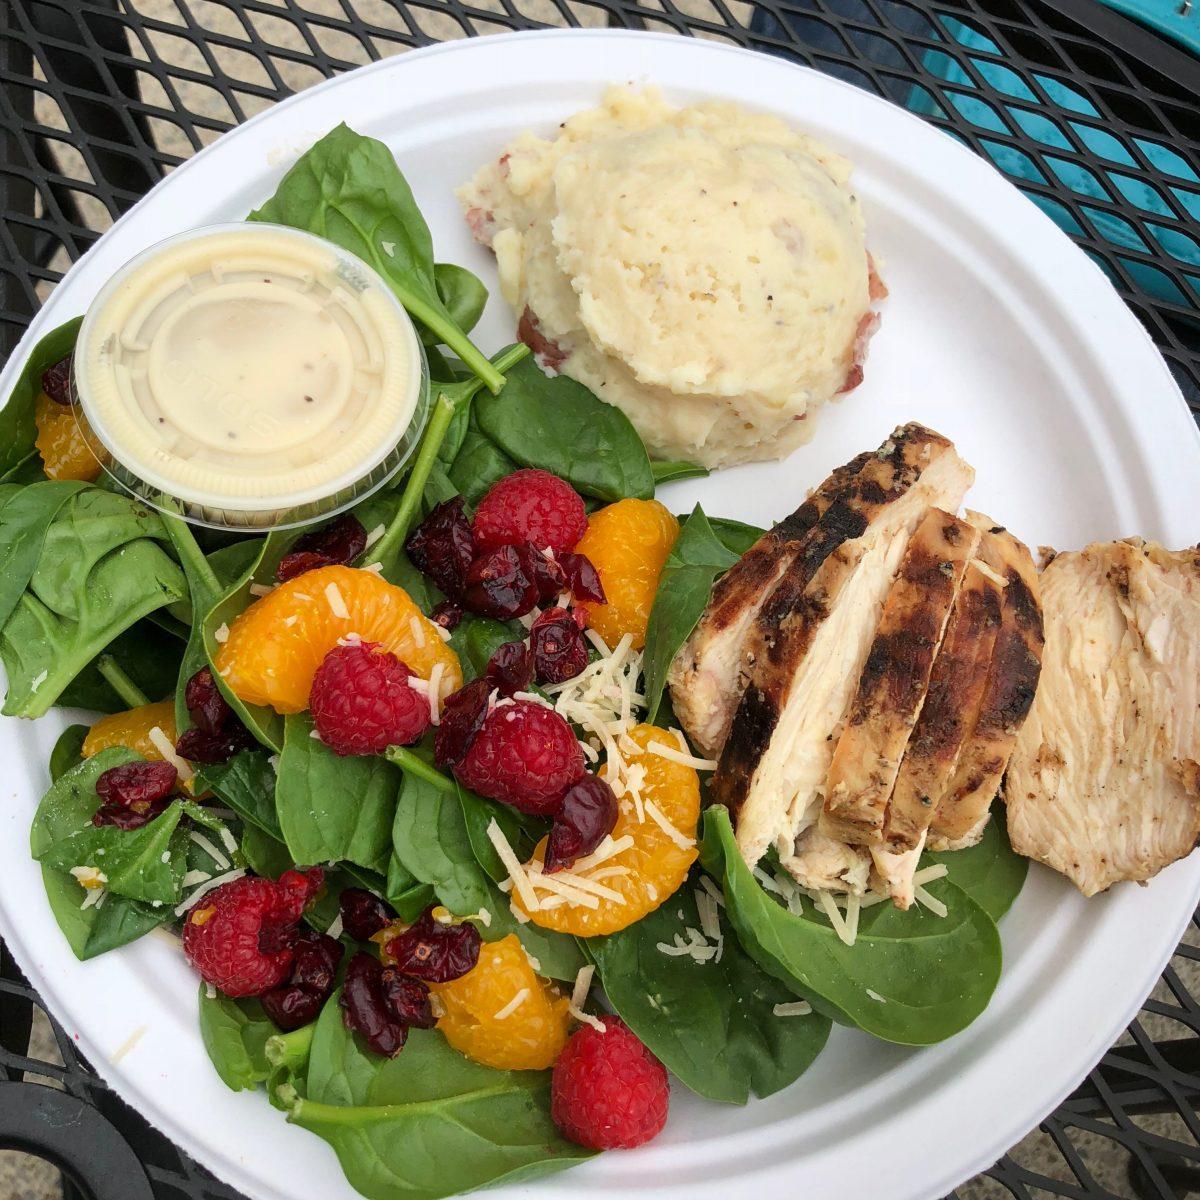 Nashville Restaurants: Brown Bag from Spinach TIger